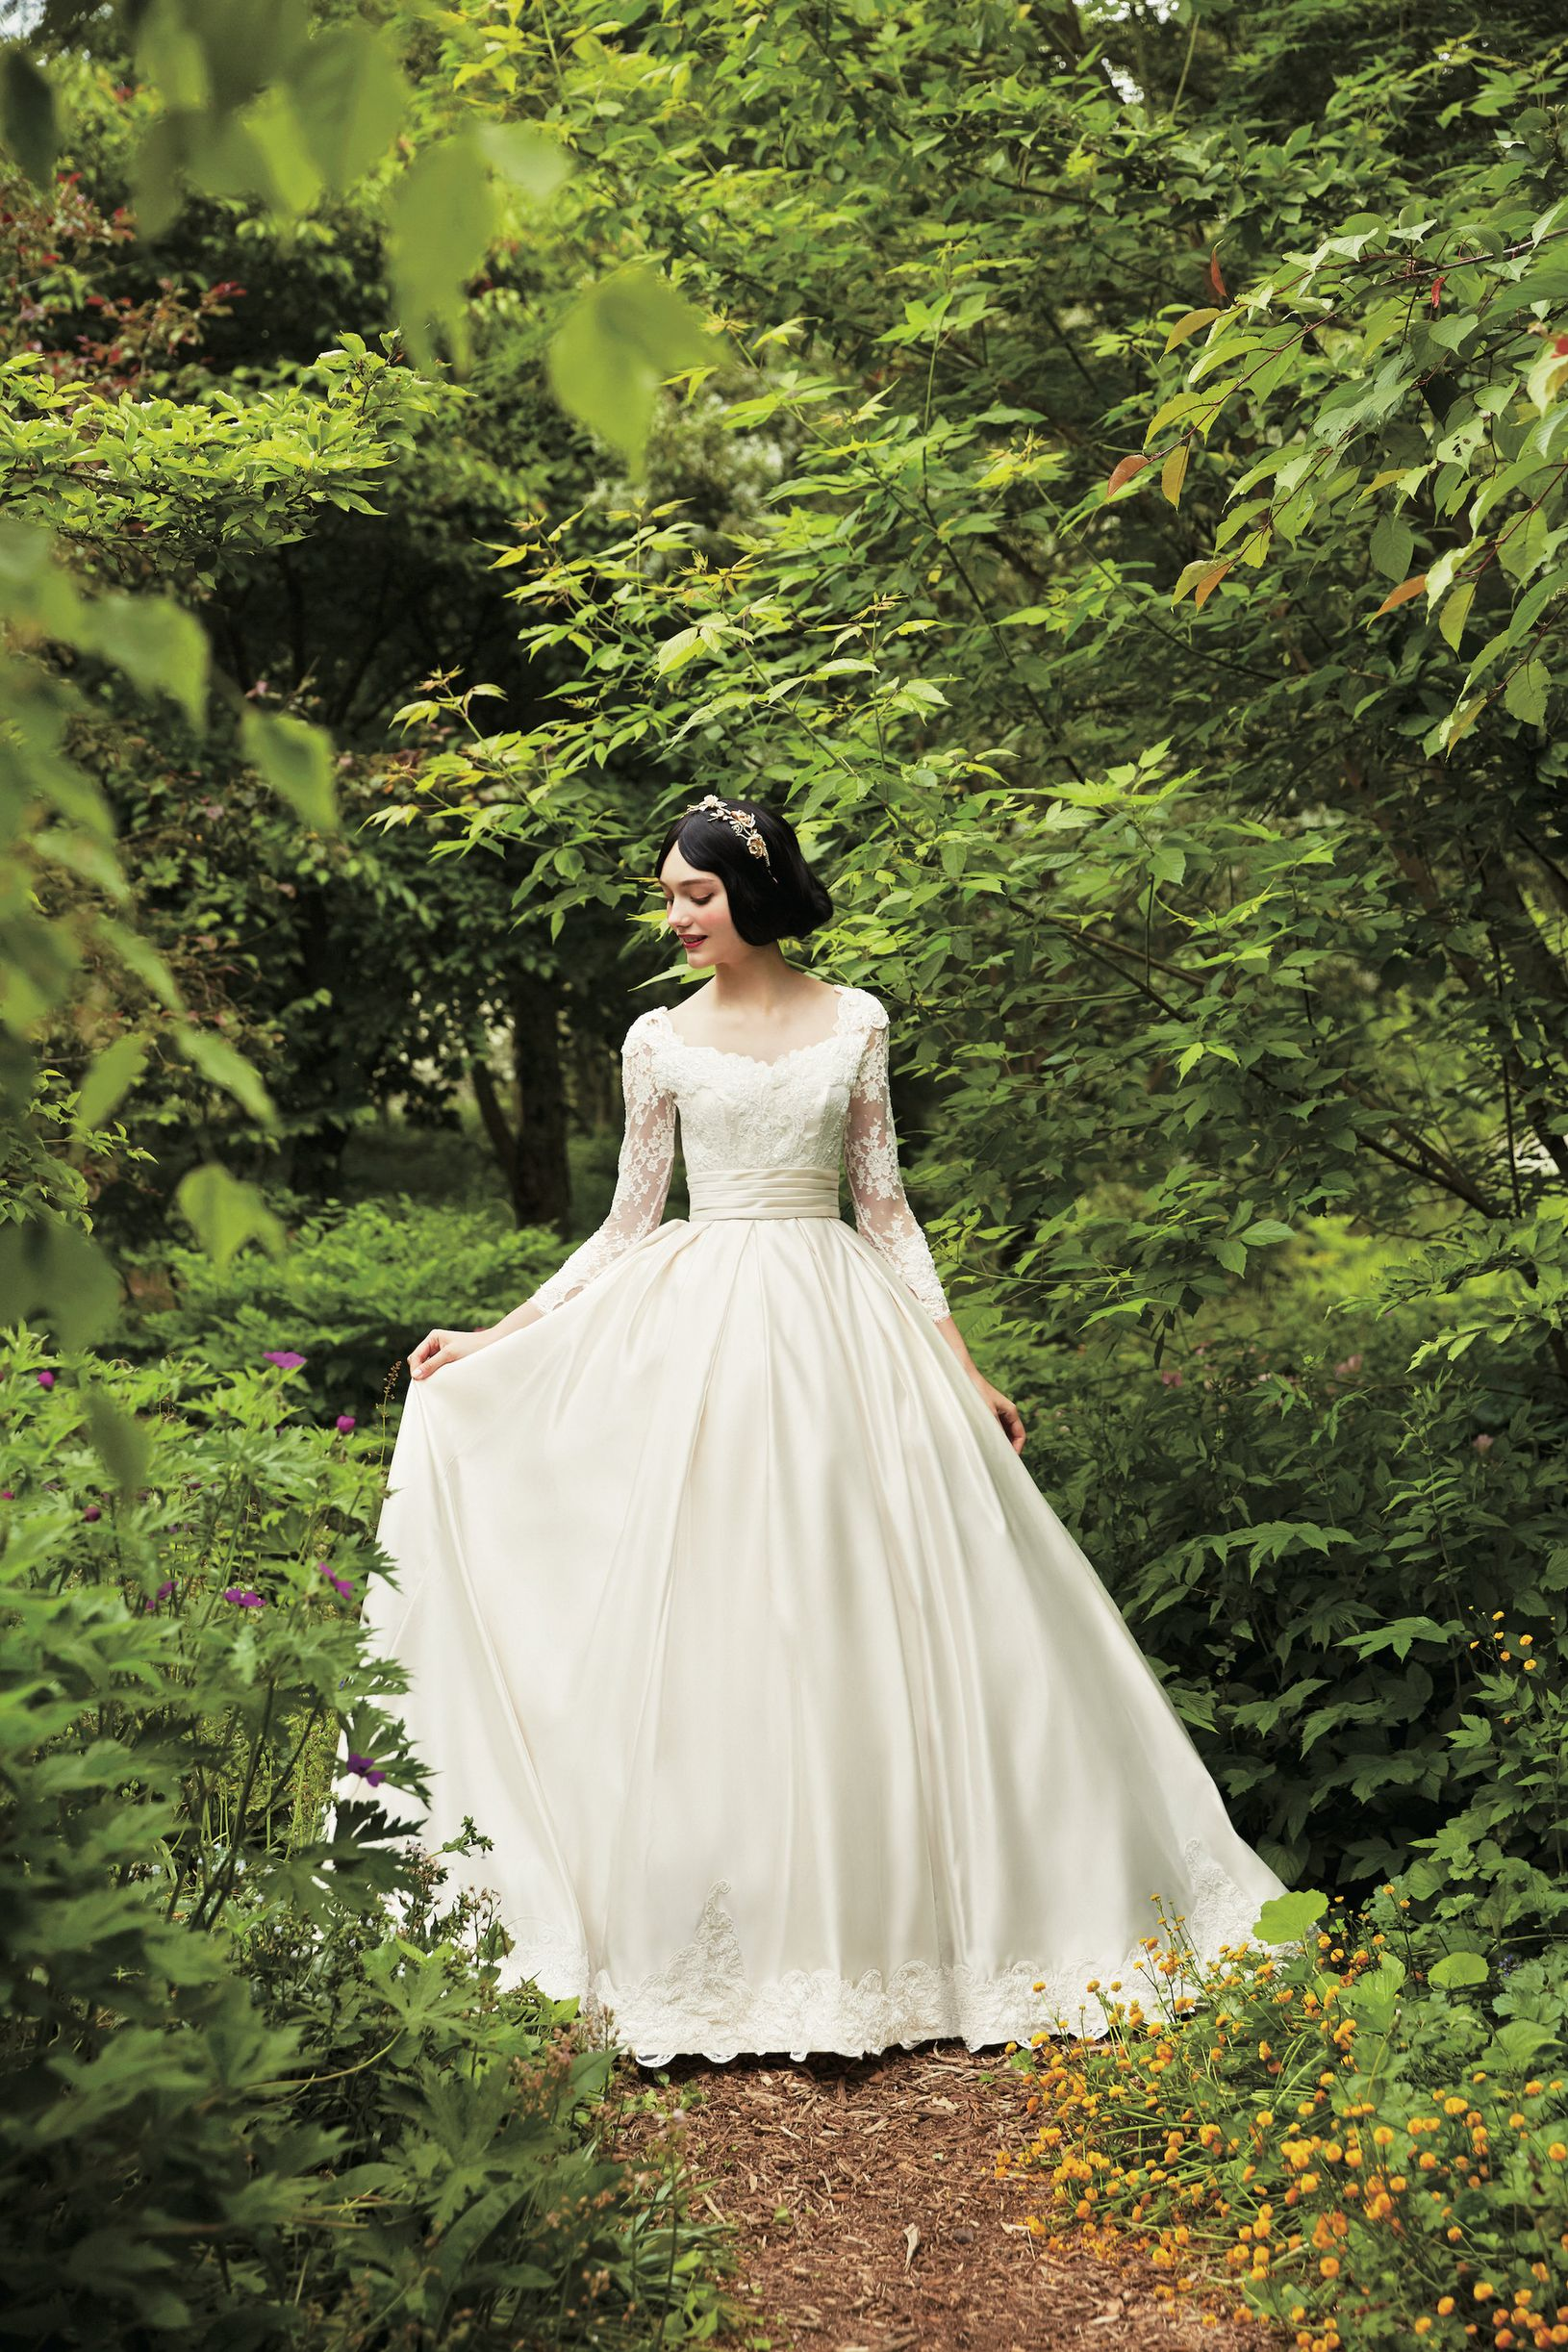 New princess wedding